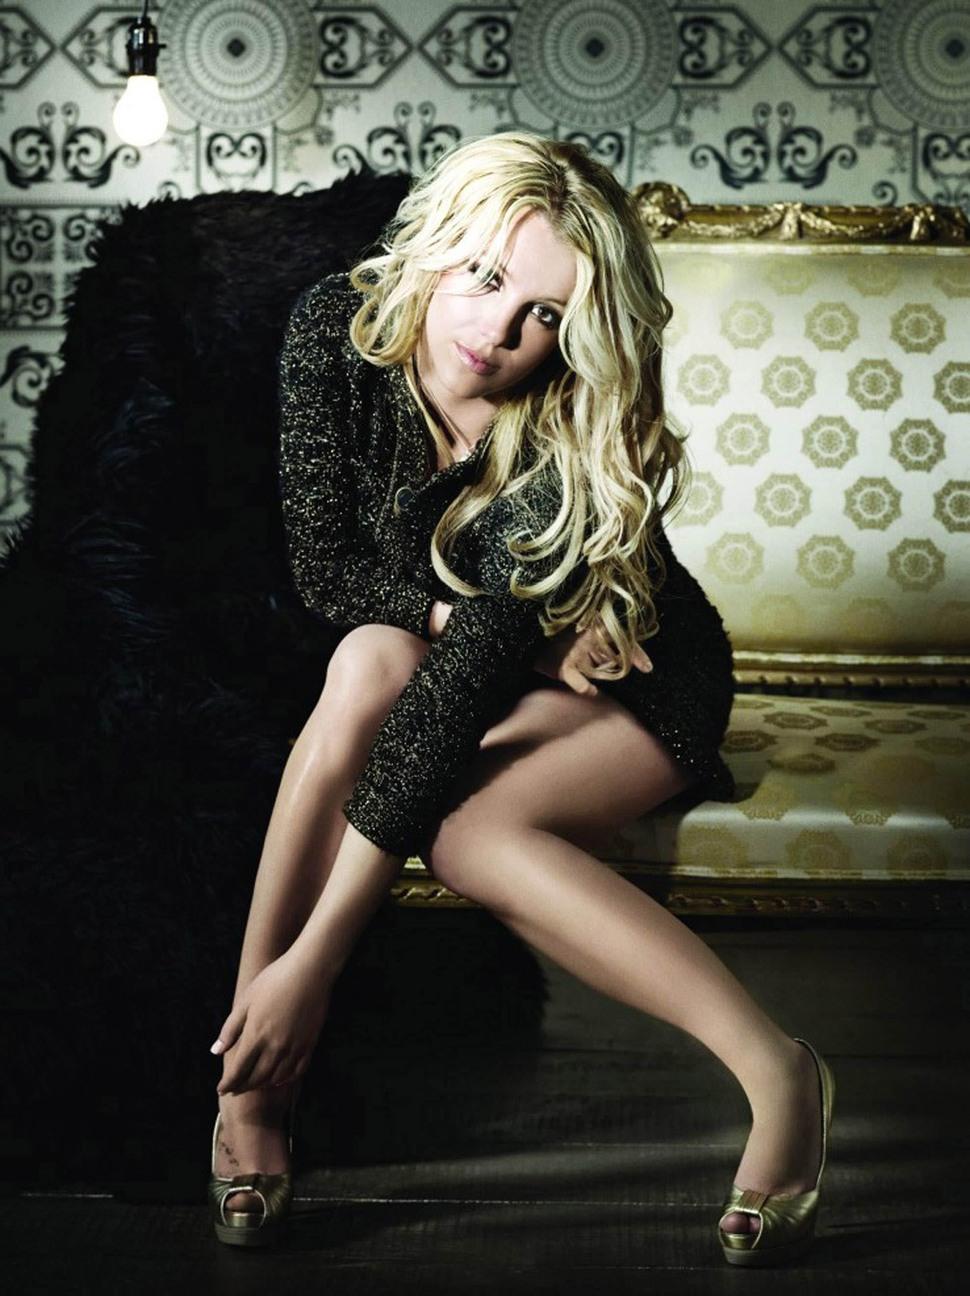 "Промо-фото Бритни Спирс к новому альбому ""Femme Fatale"""